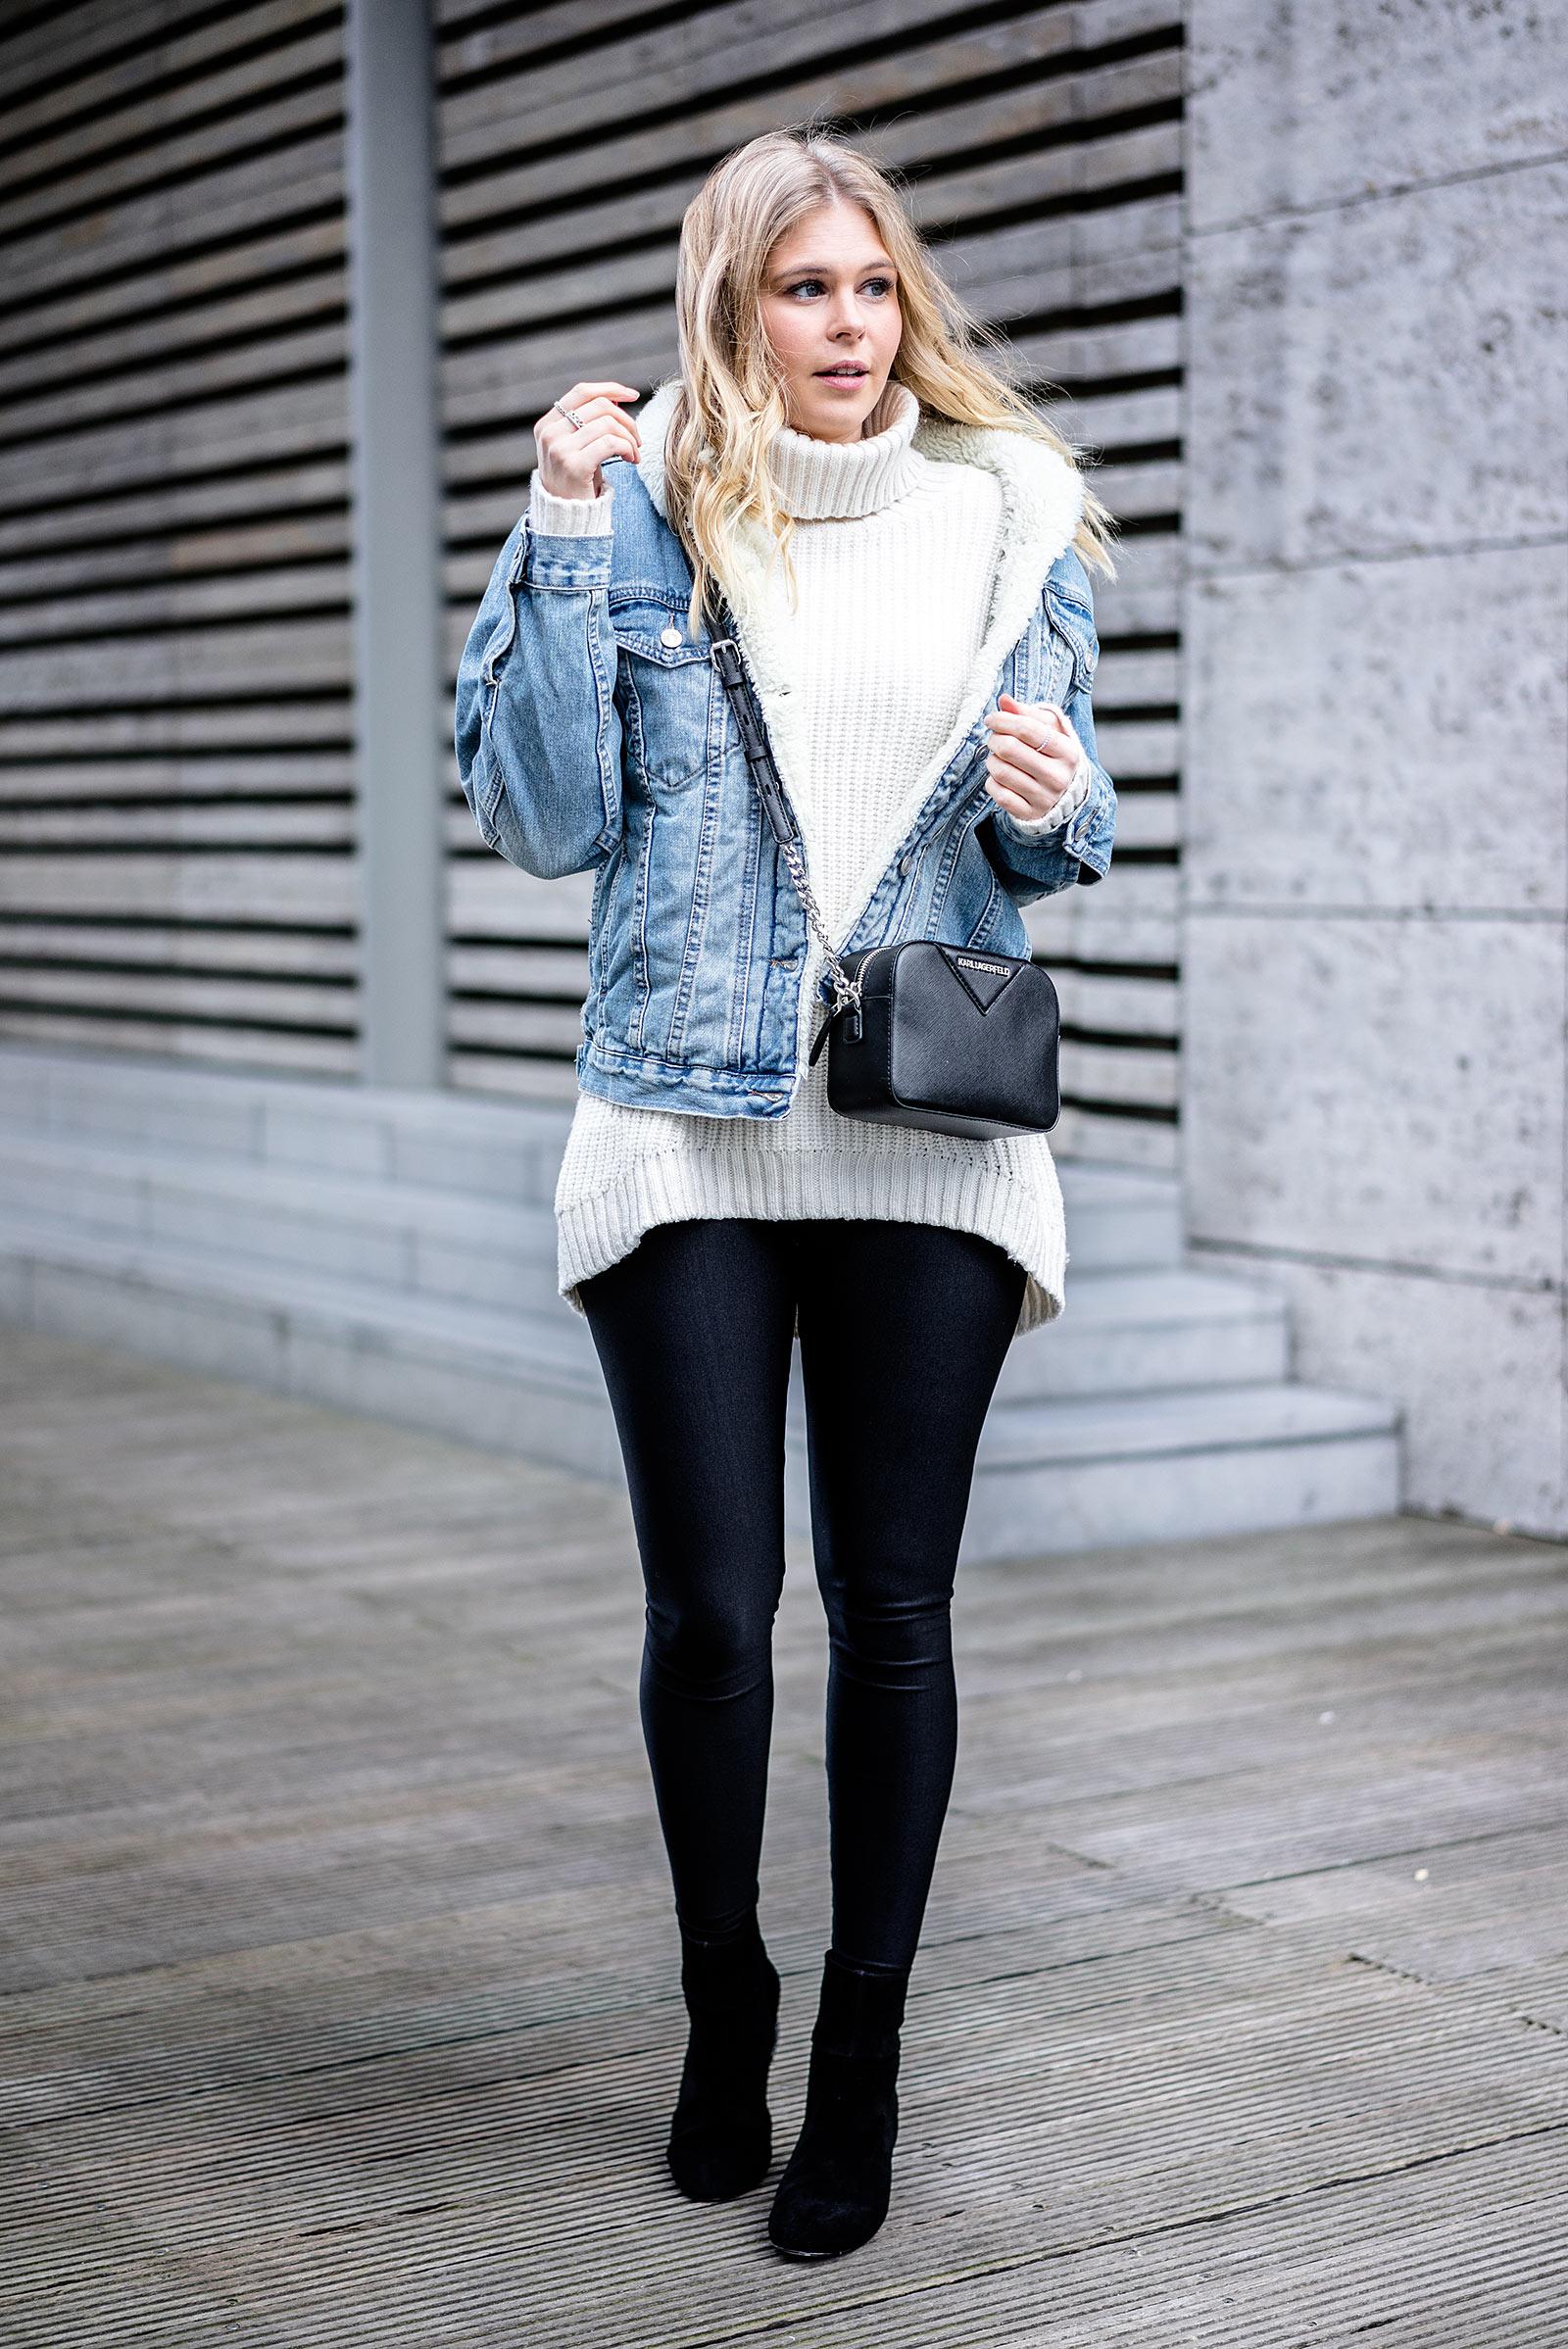 Fashionblogger ootd Streetstyle Outfit Jeansjacke Rollkragenpullover Sunnyinga